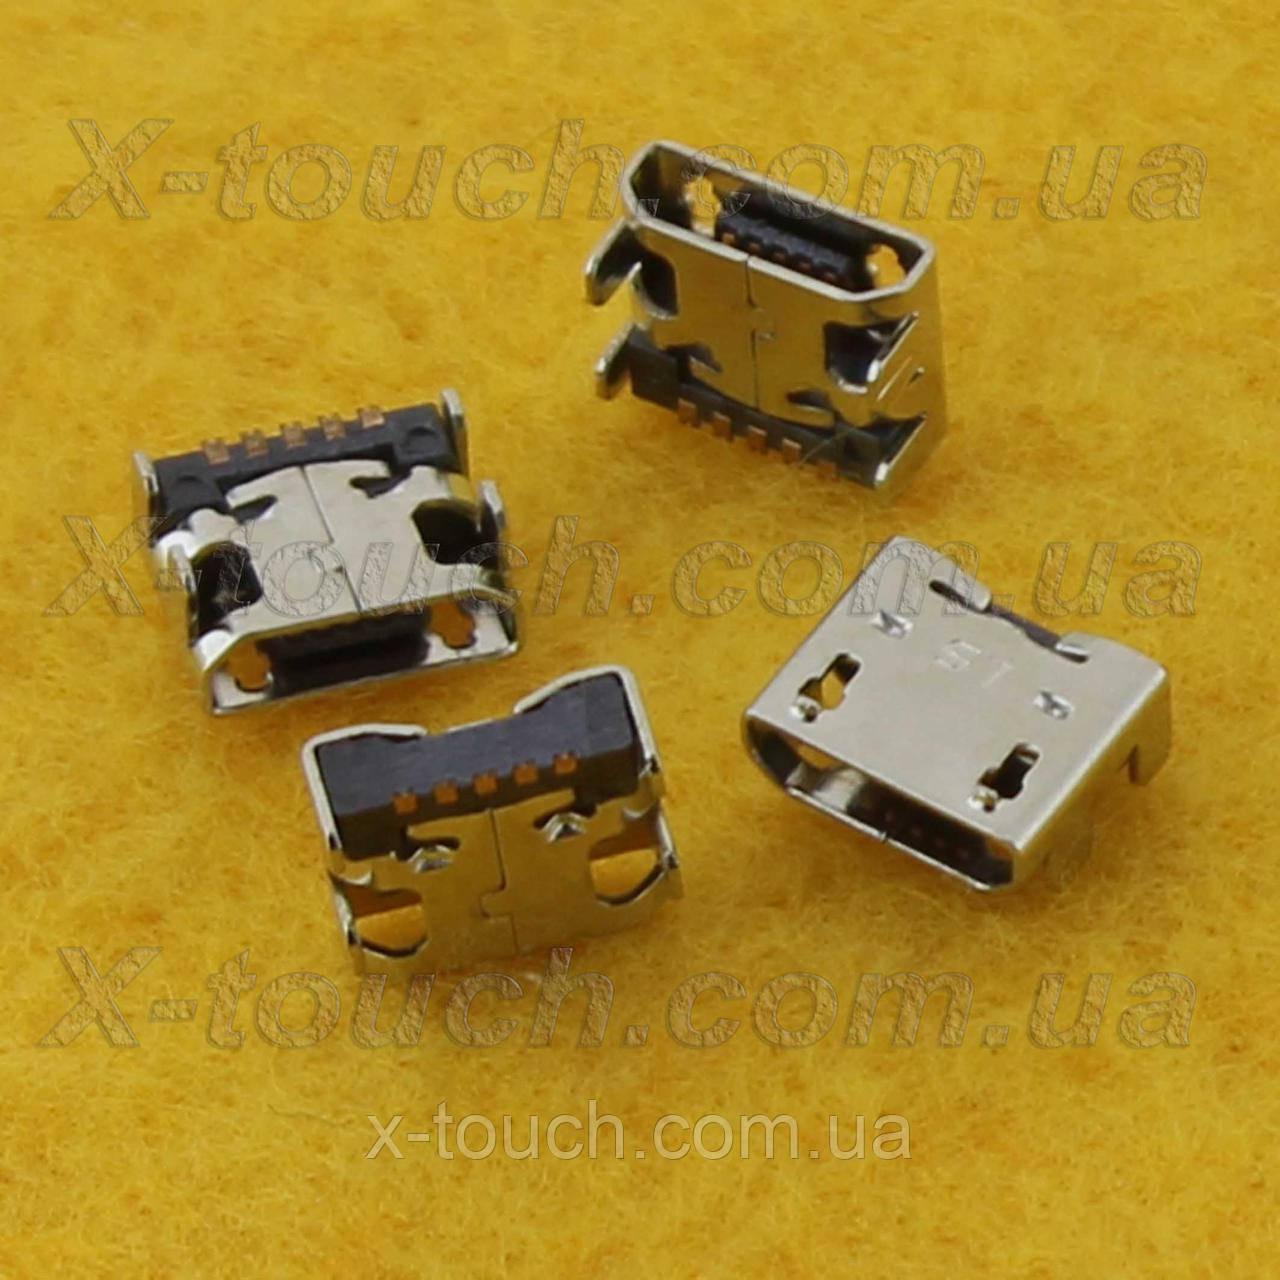 Lg Optimus L7 p700 разъем зарядки micro USB BF 5pin.